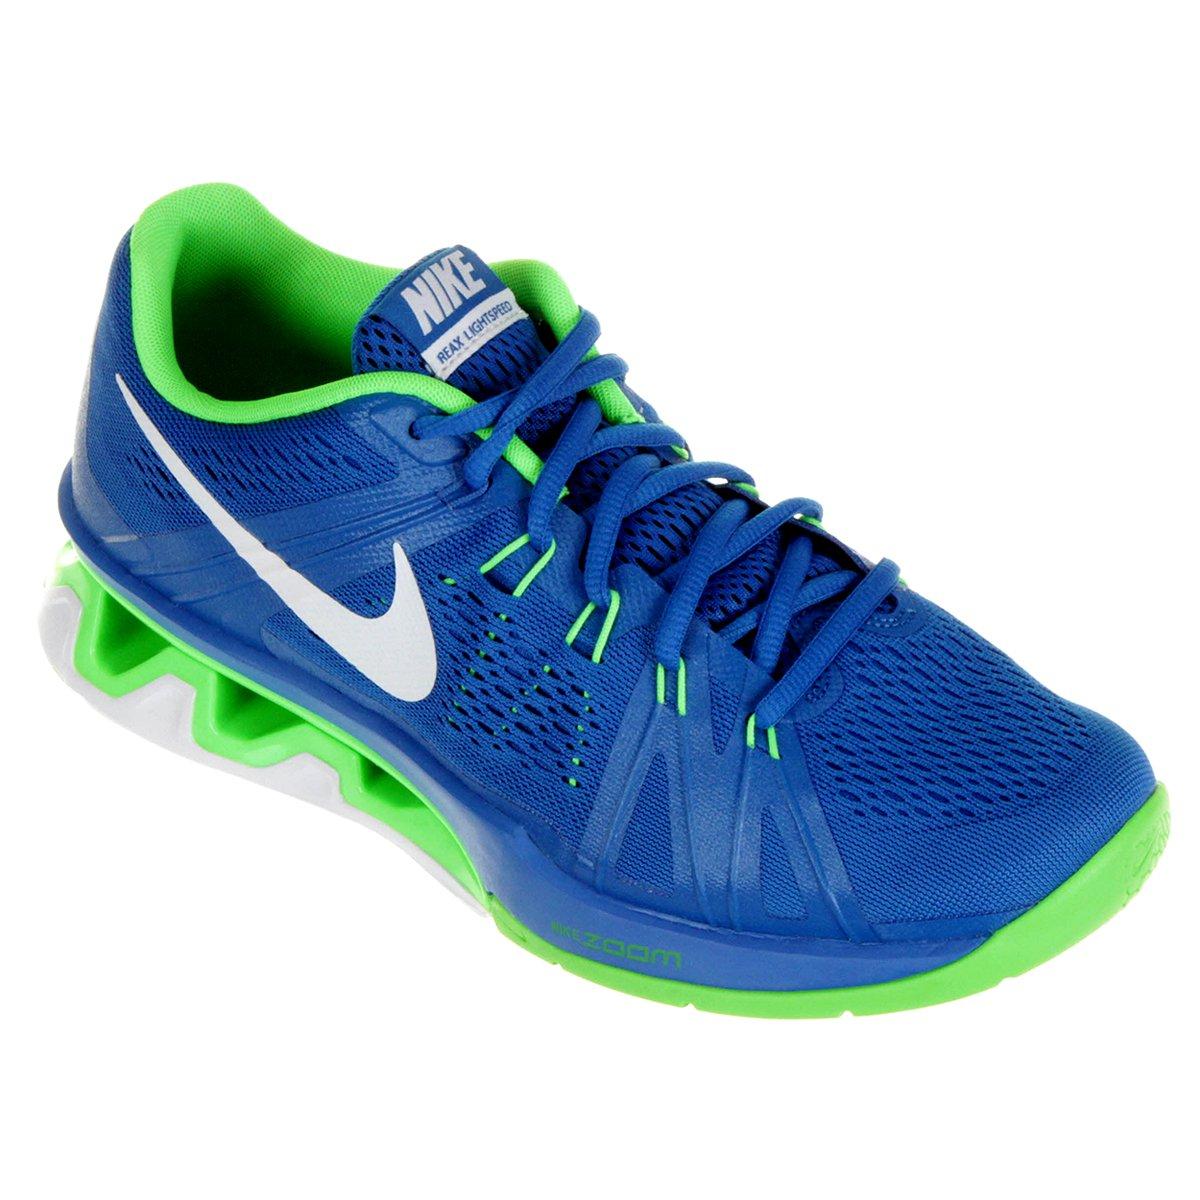 29d44a4be01 Tênis Nike Reax Lightspeed Masculino - Compre Agora